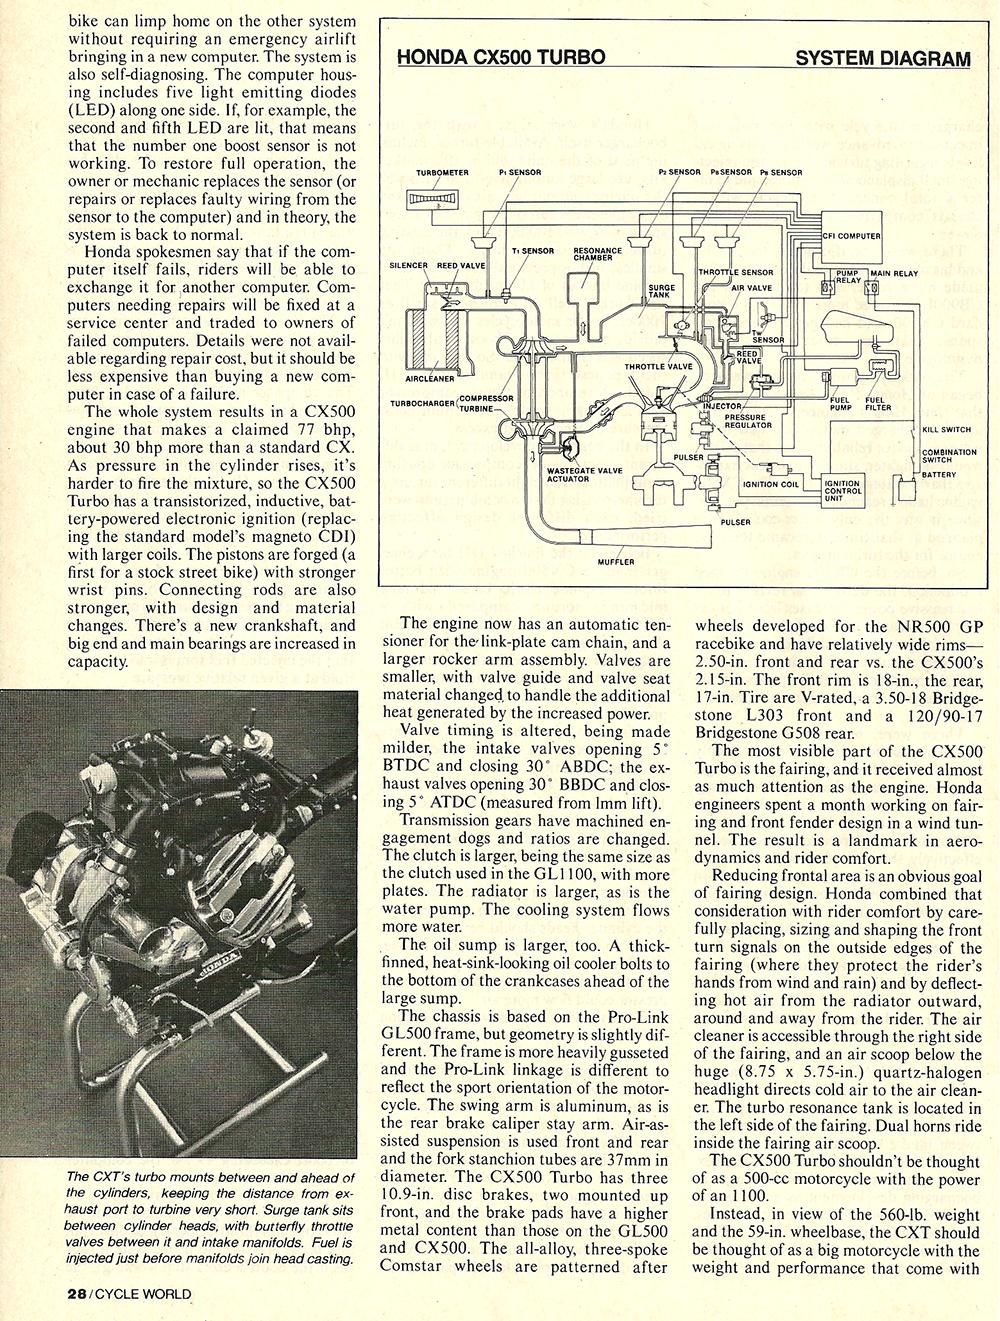 1981 Honda CX500 Turbo road test 3.jpg